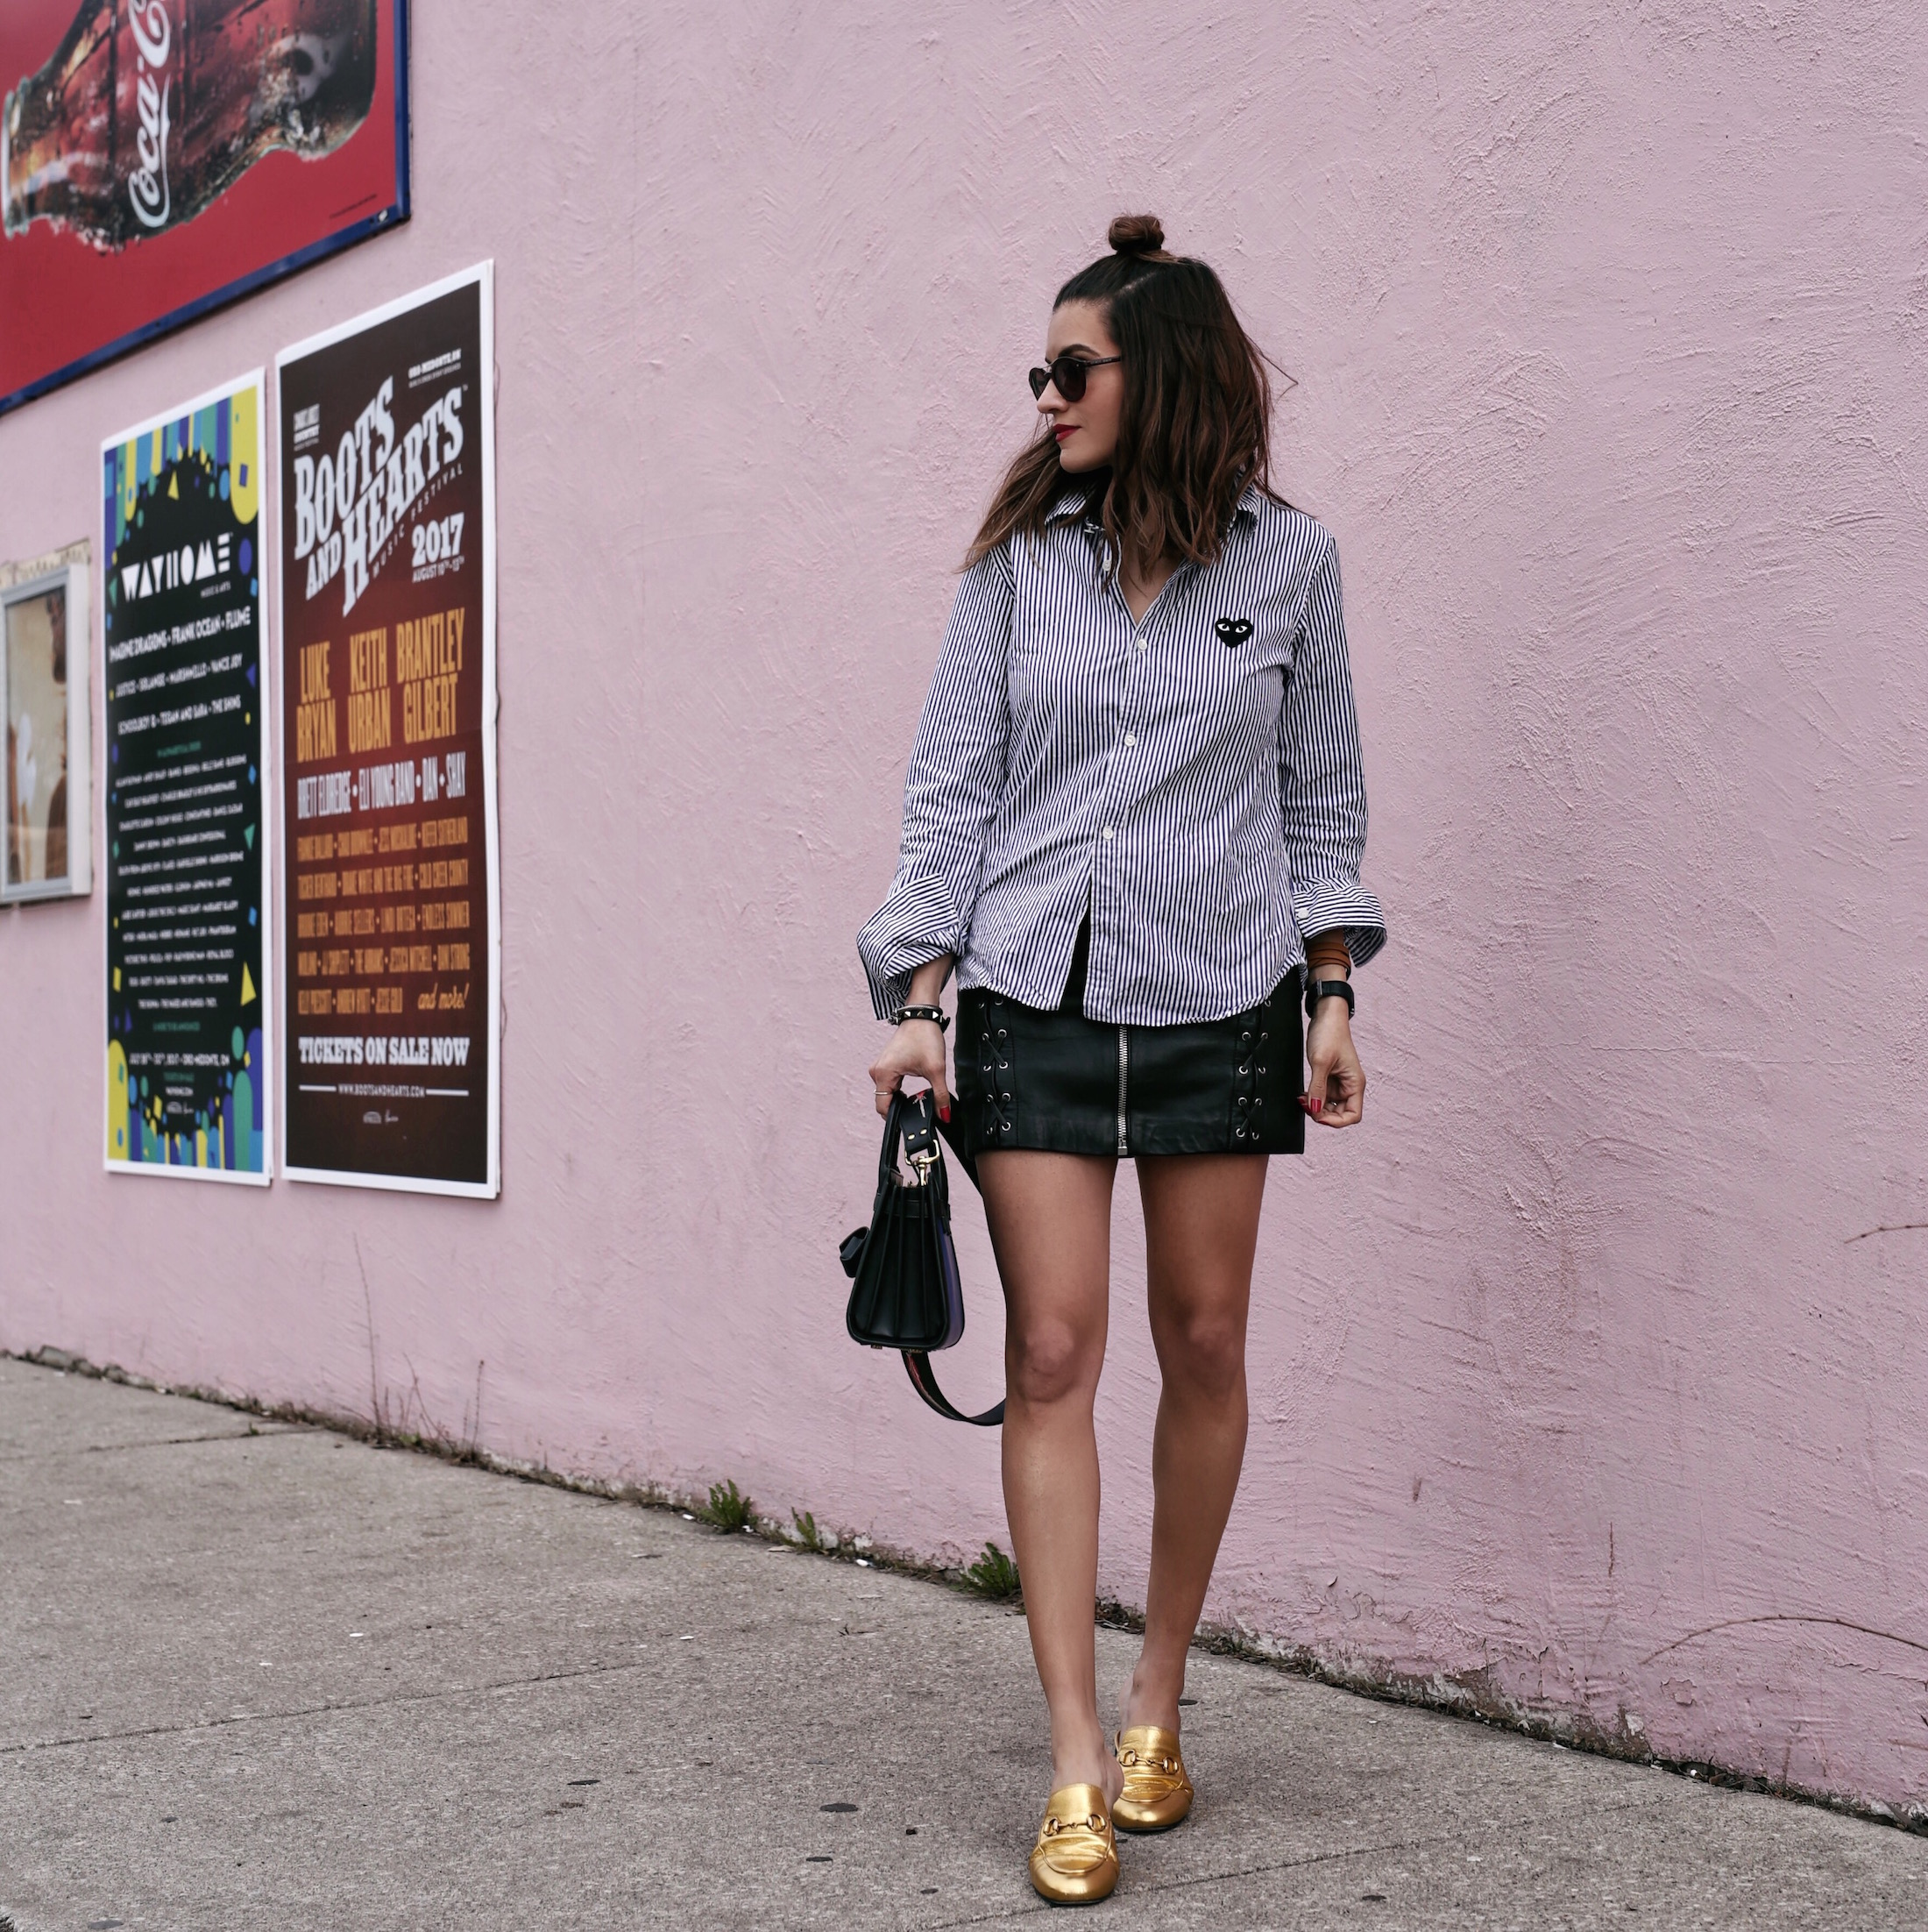 comme des garcons striped shirt - blue saint laurent nano sac de jour bag - kate cate handbag strap - the kooples leather zip skirt - summer style - top bun hair style - woahstyle_8080.JPG